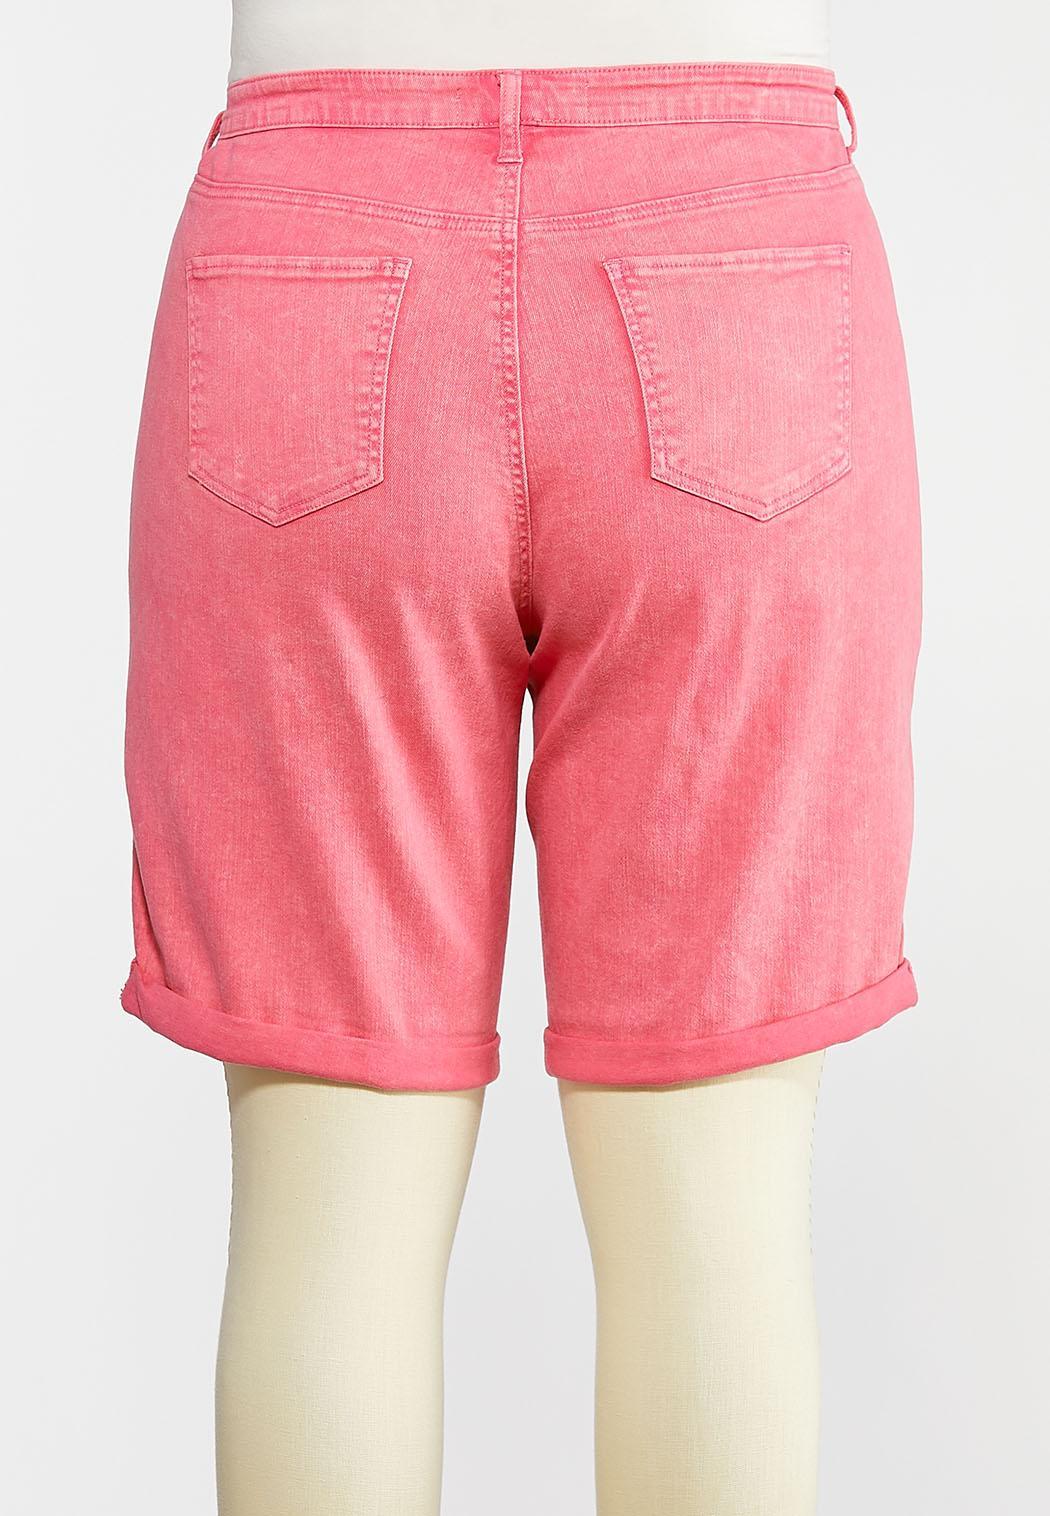 Plus Size Pink Denim Bermuda Shorts (Item #44241909)